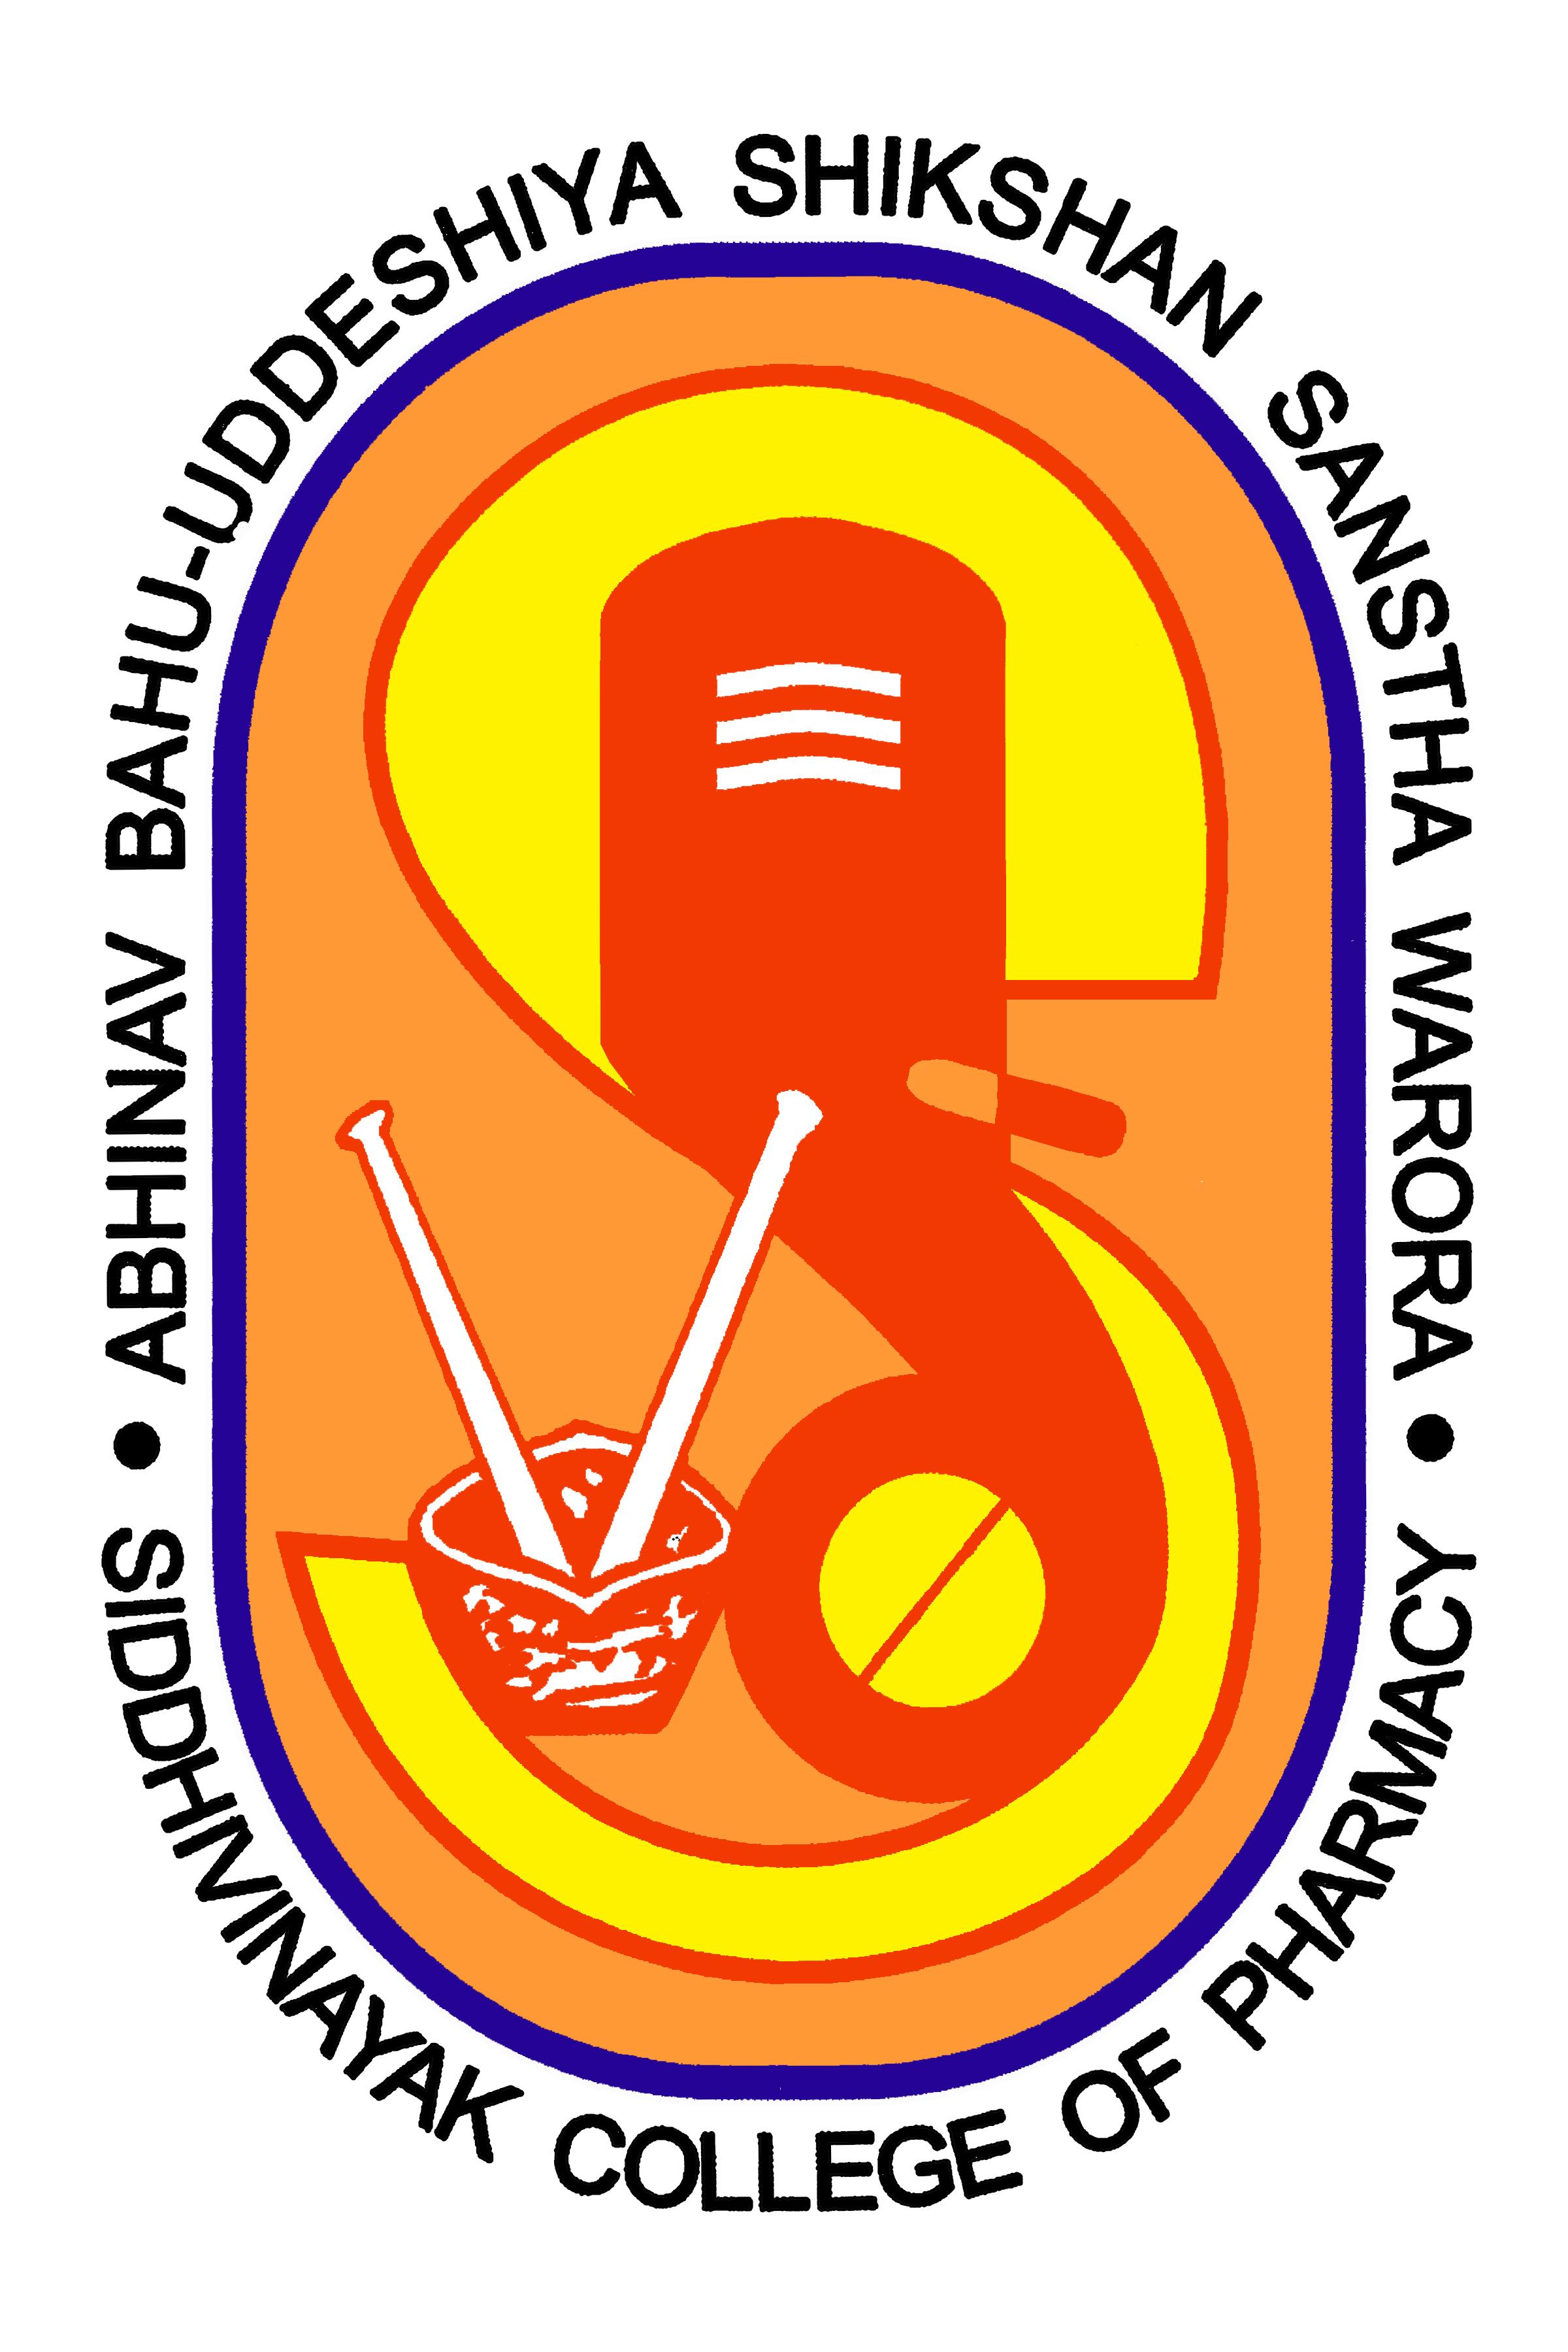 https://s3.ap-south-1.amazonaws.com/vmedulife-s3/logo/05-02-2019-LOGO-78-1549360674.jpg